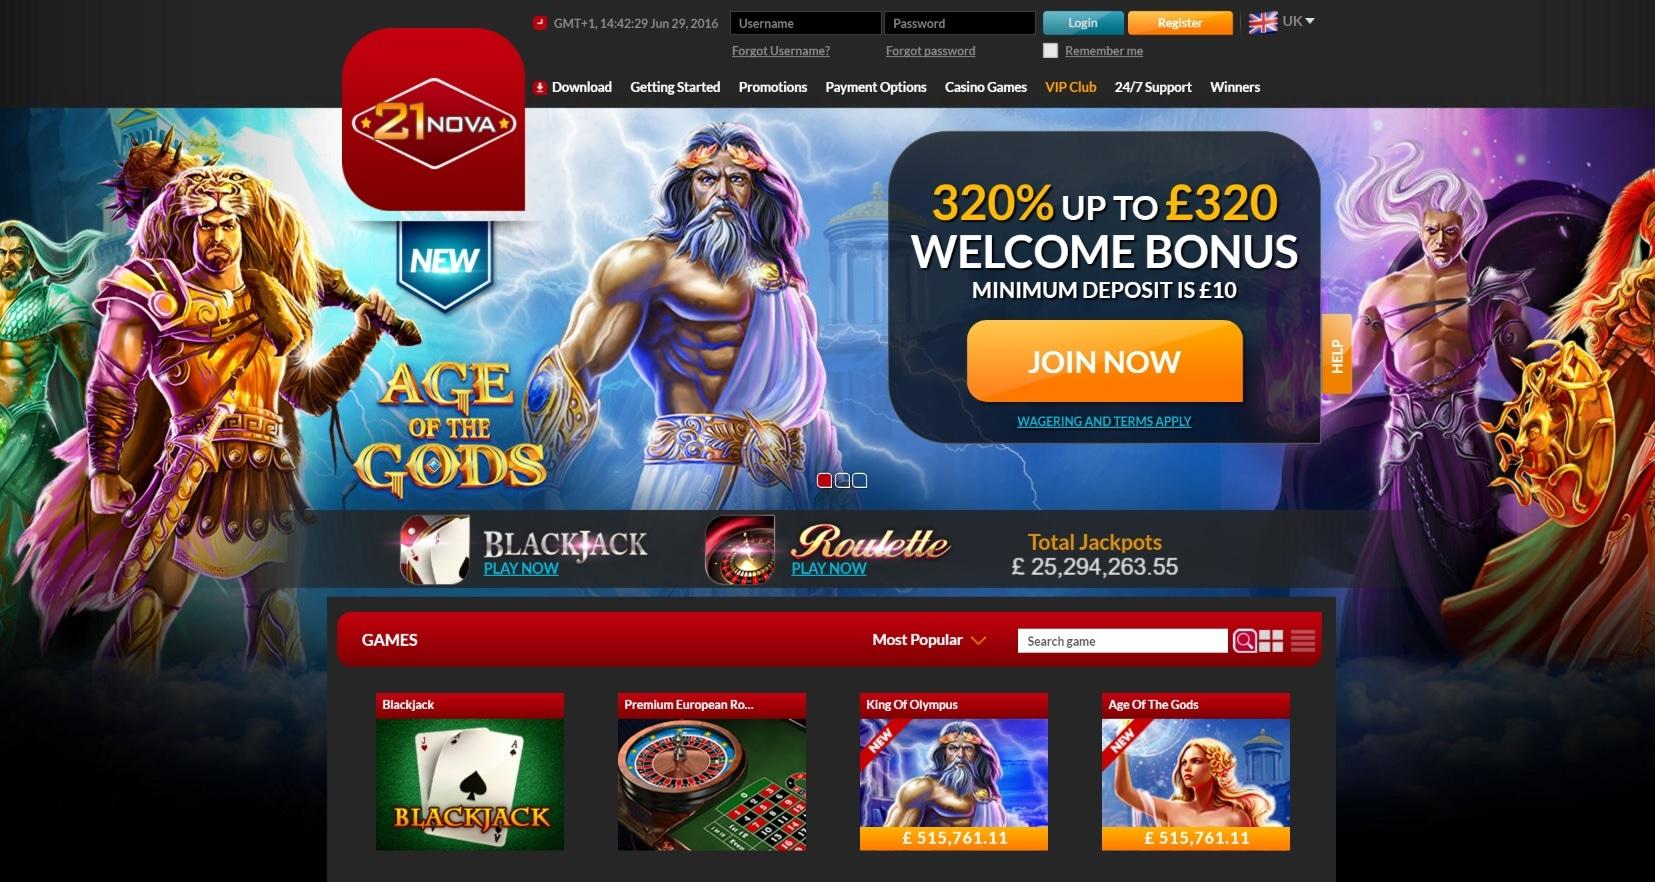 paypal casino site 21nova overview